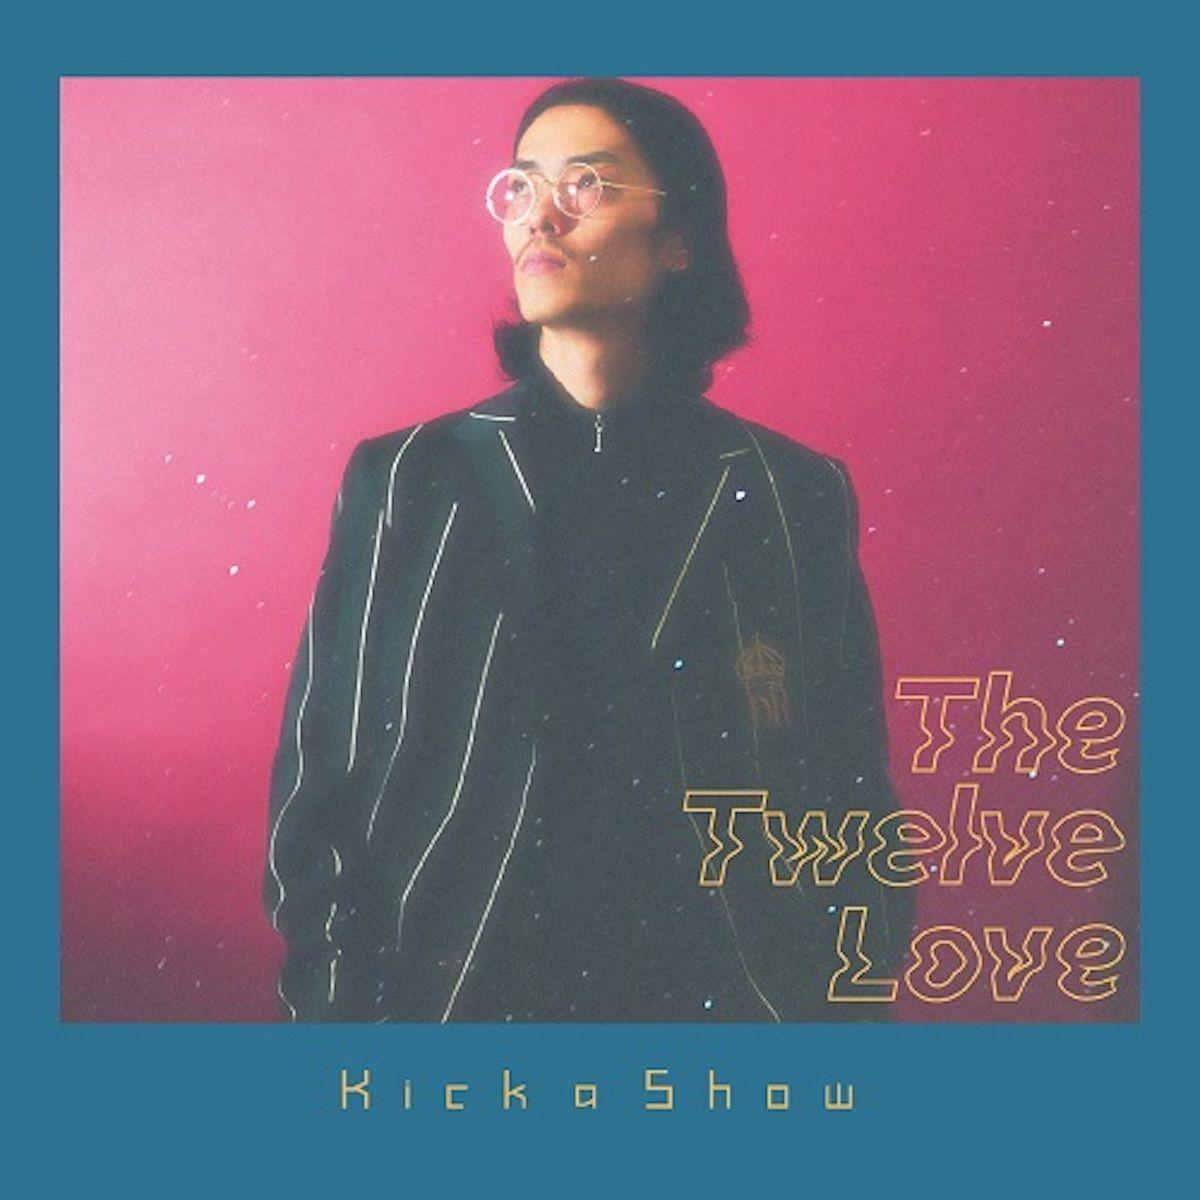 More Than おチョメ論 by Kick a Show 〜動画と感度の狭間〜 column-kick-a-show-1-1200x1200